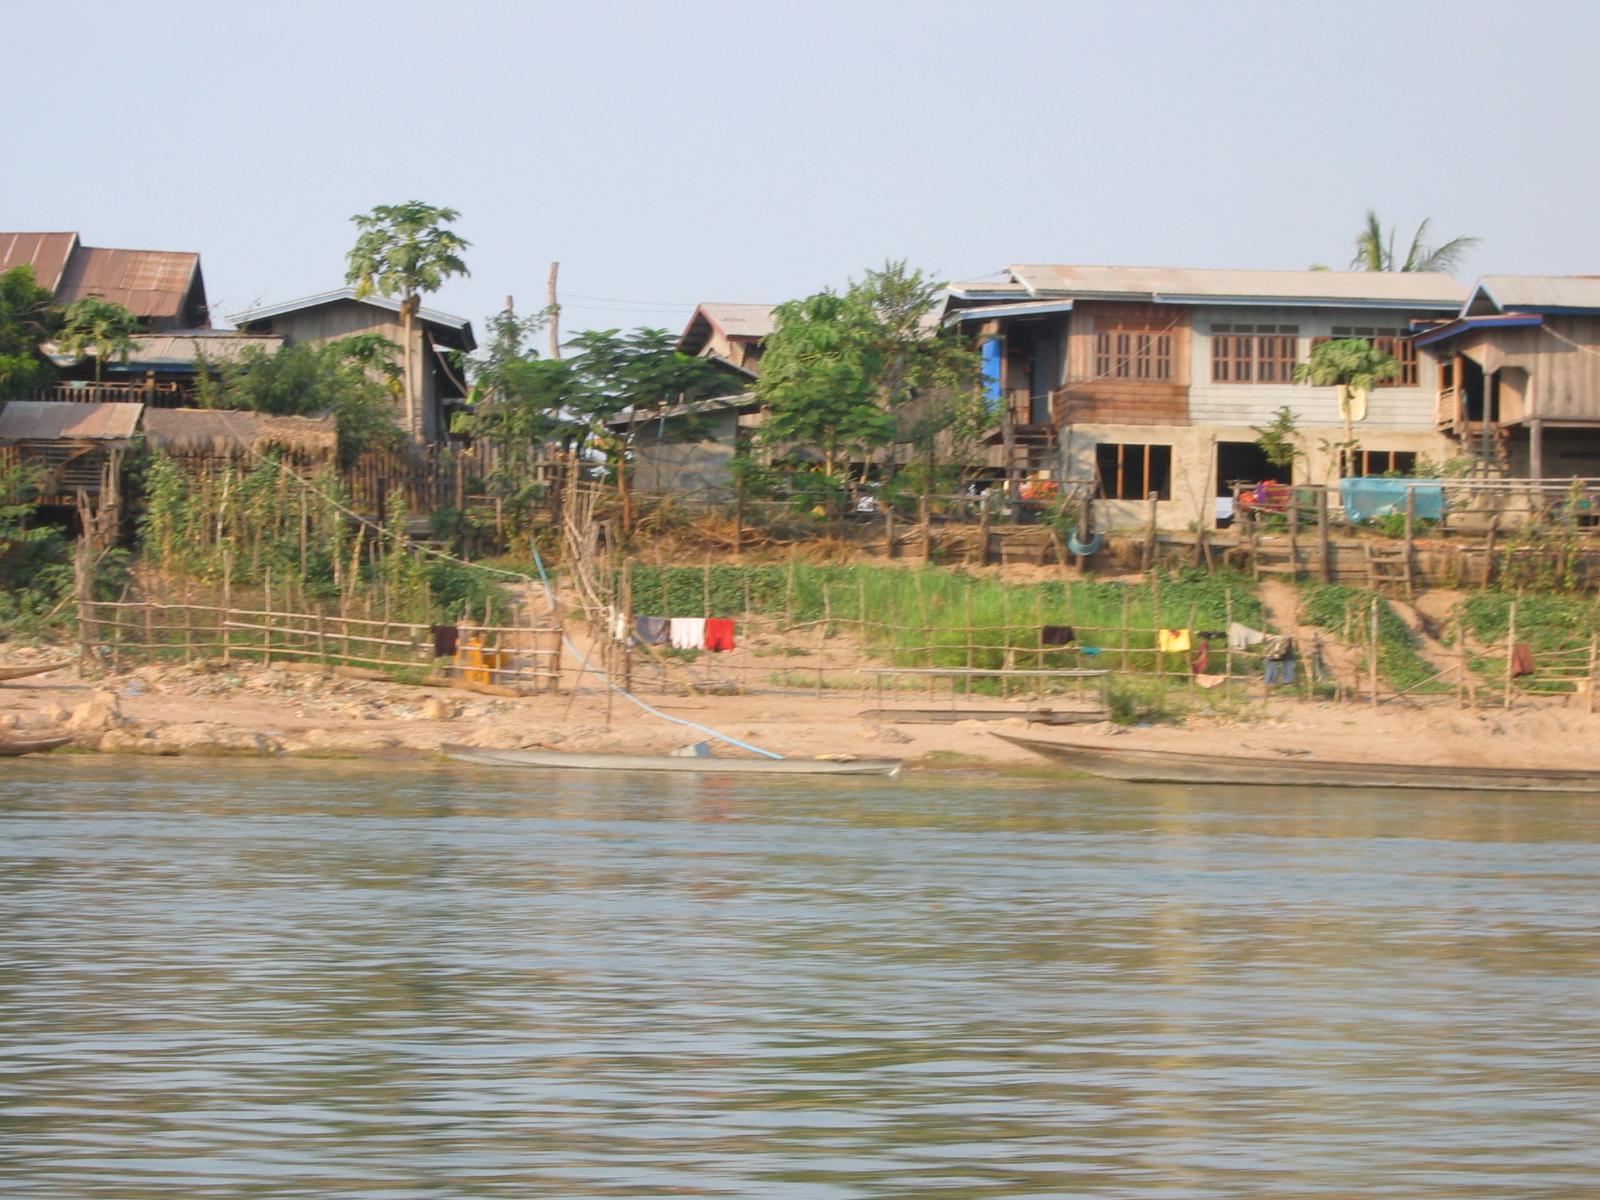 4000-iles-laos (9)